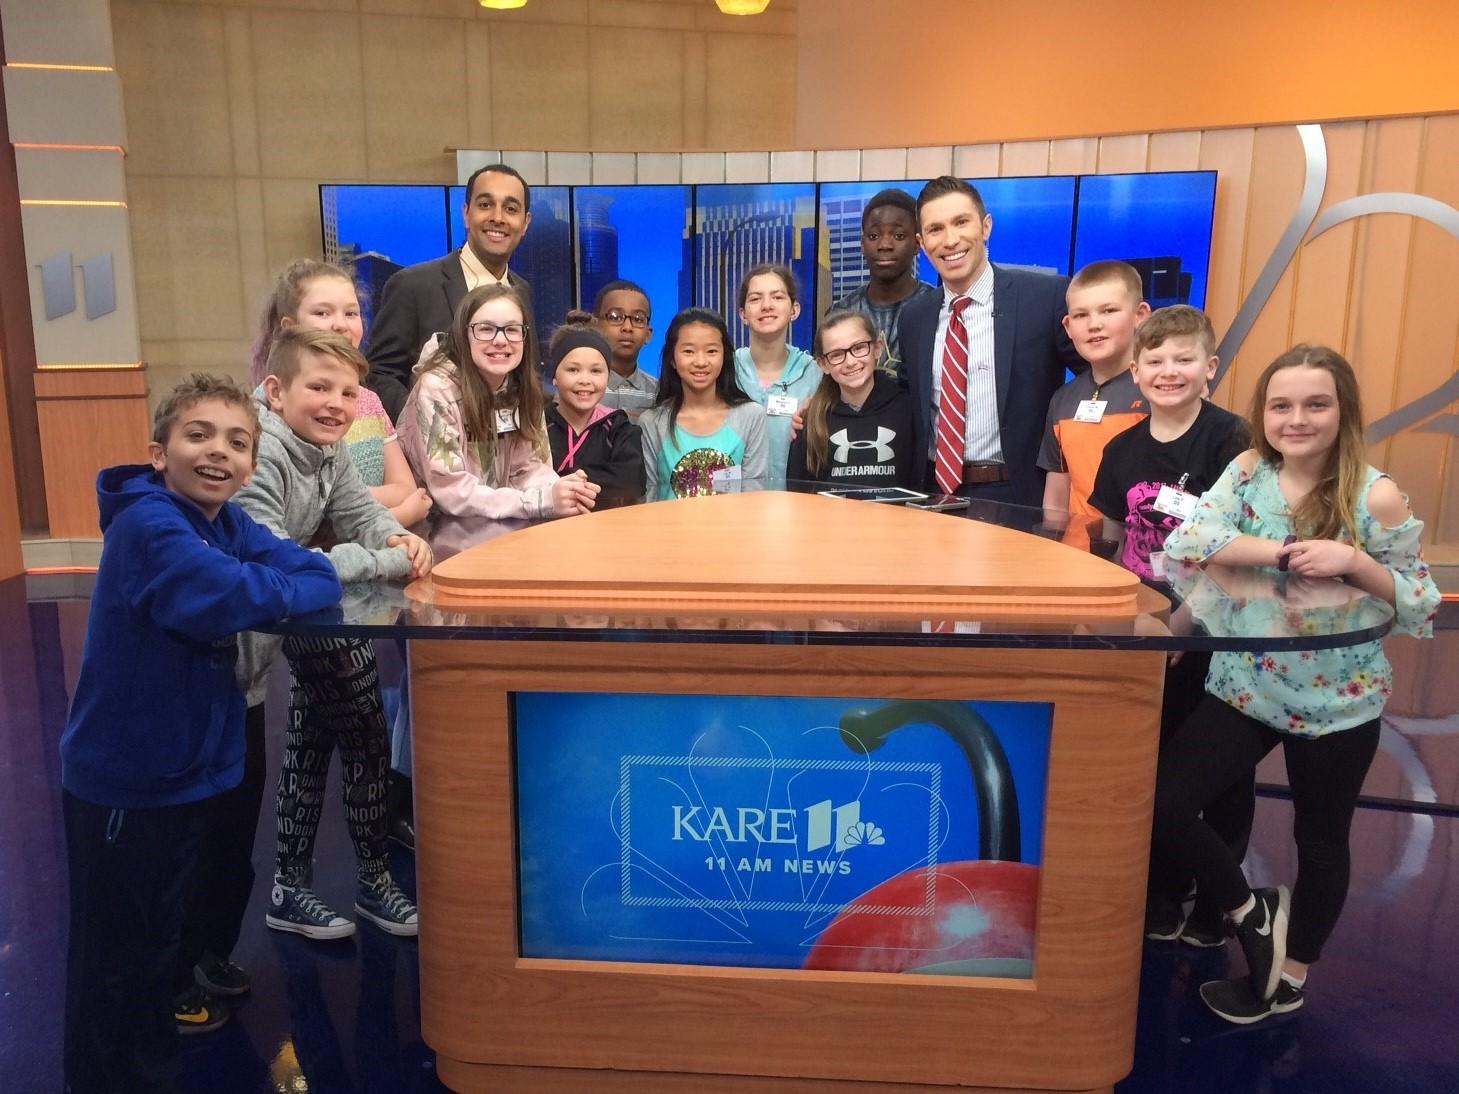 visit a news station